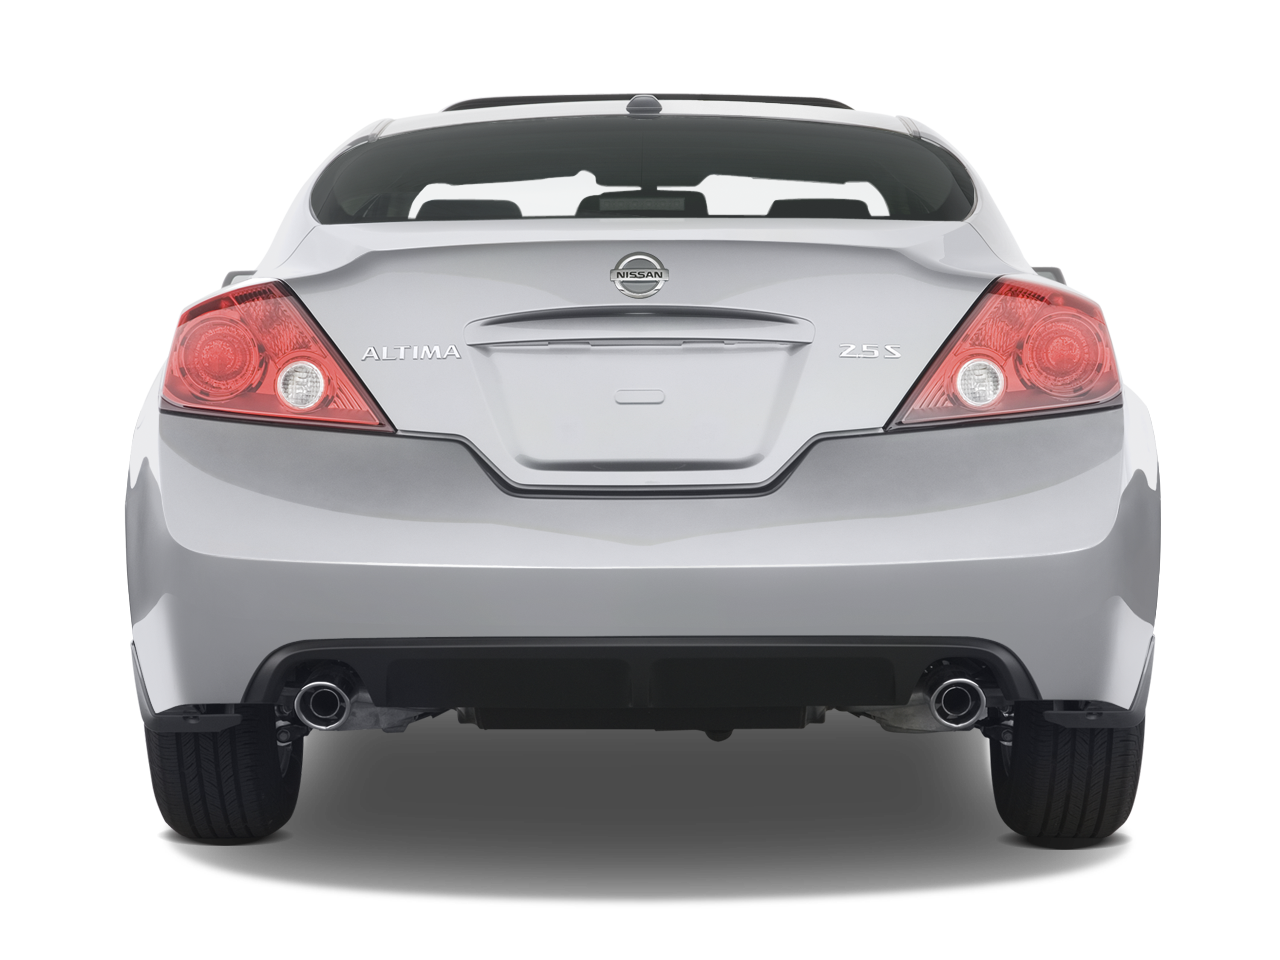 2009 Nissan Altima Hybrid Nissan Hybrid Sedan Review Automobile Magazine